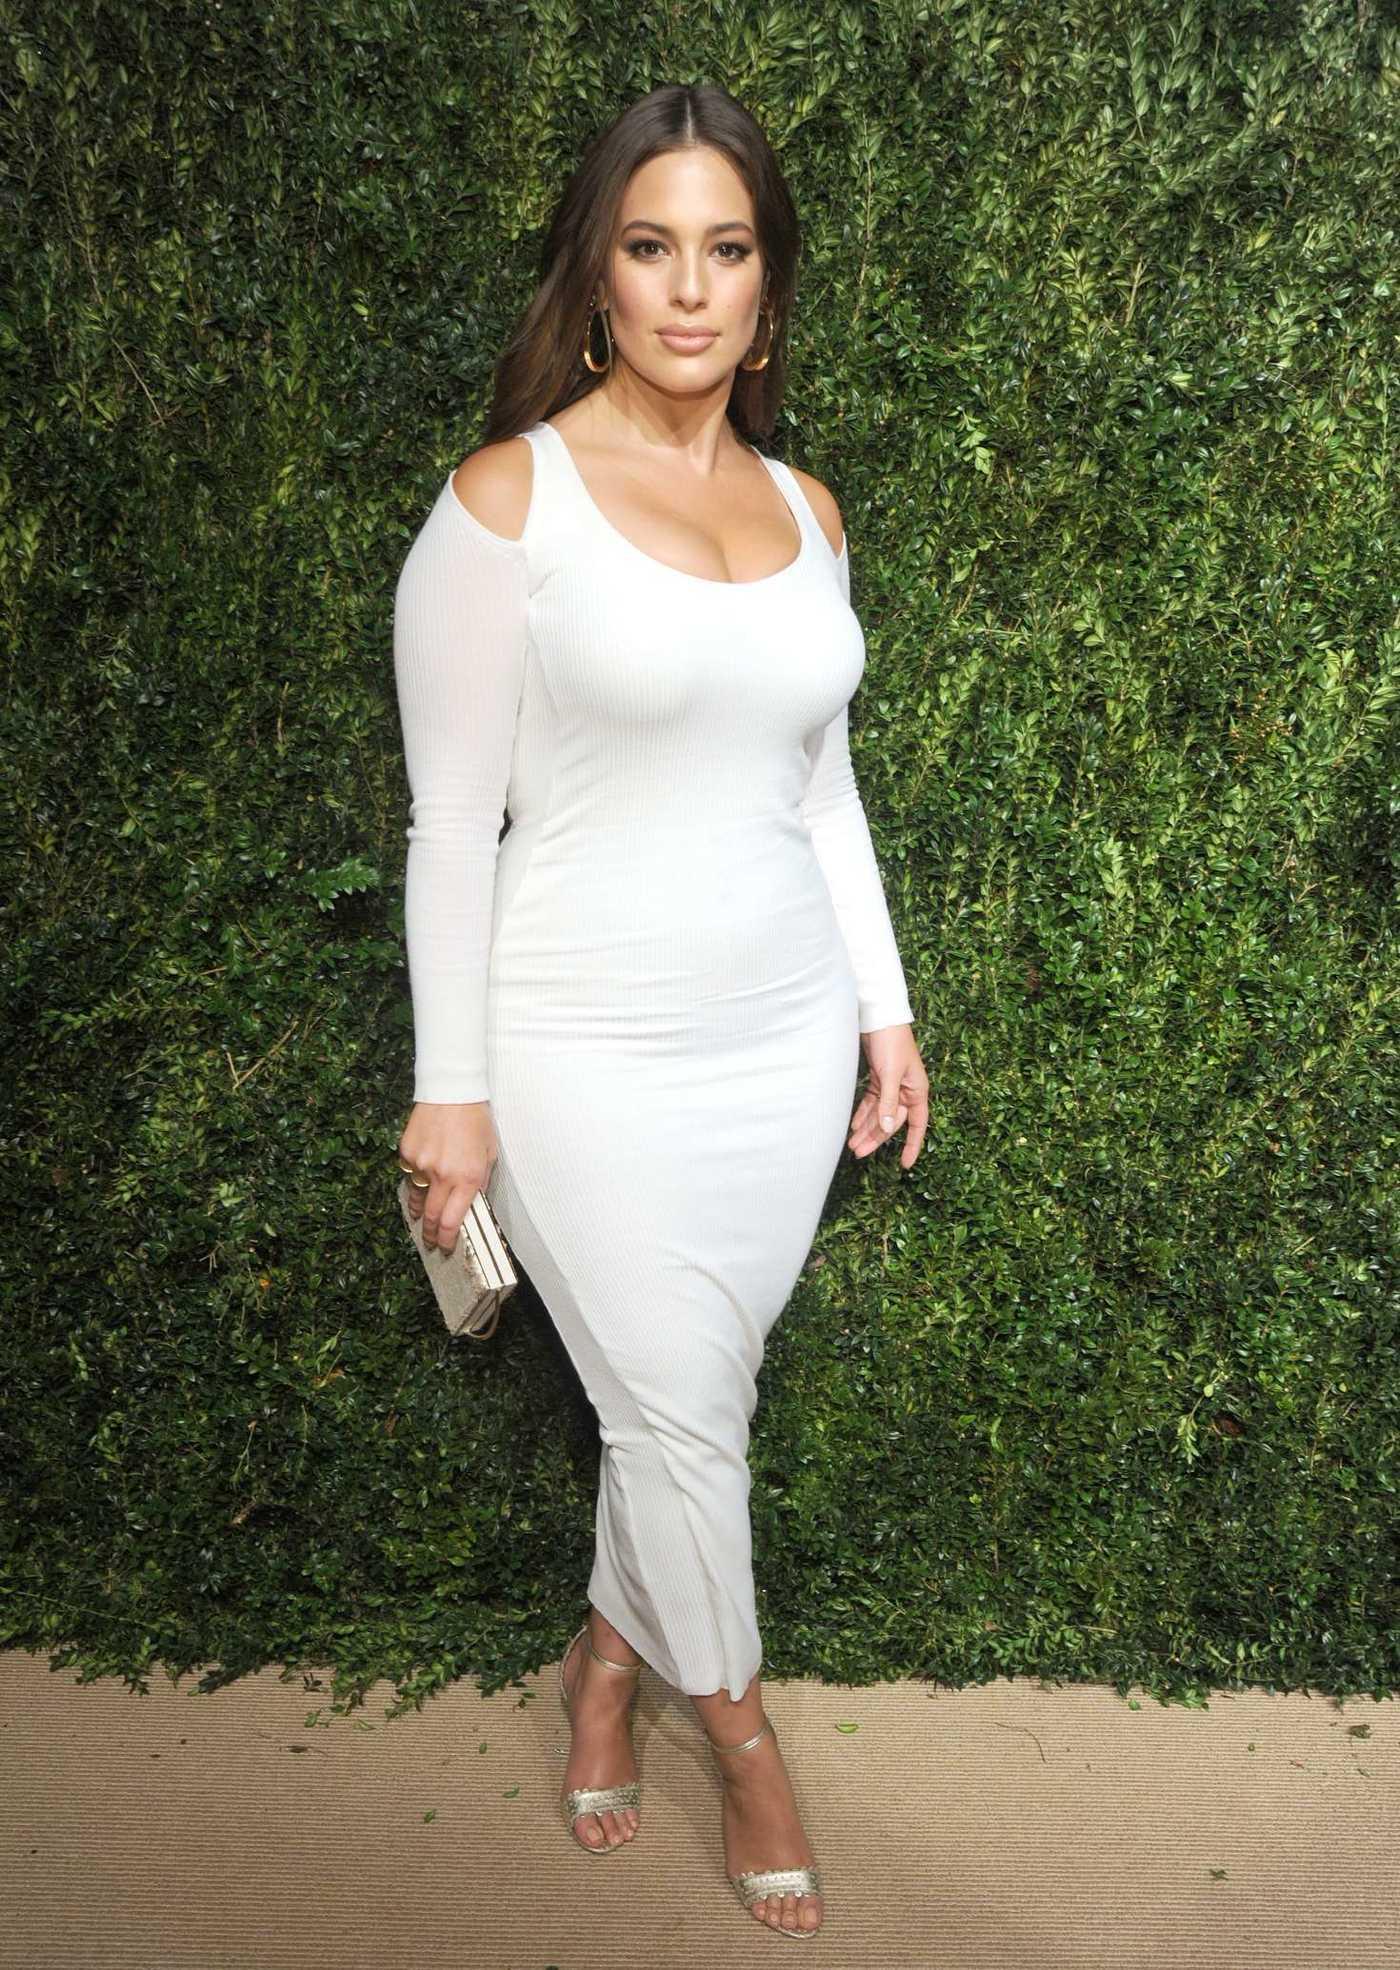 Ashley Graham at the 14th Annual CFDA Vogue Fashion Fund Awards NYC 11/06/2017